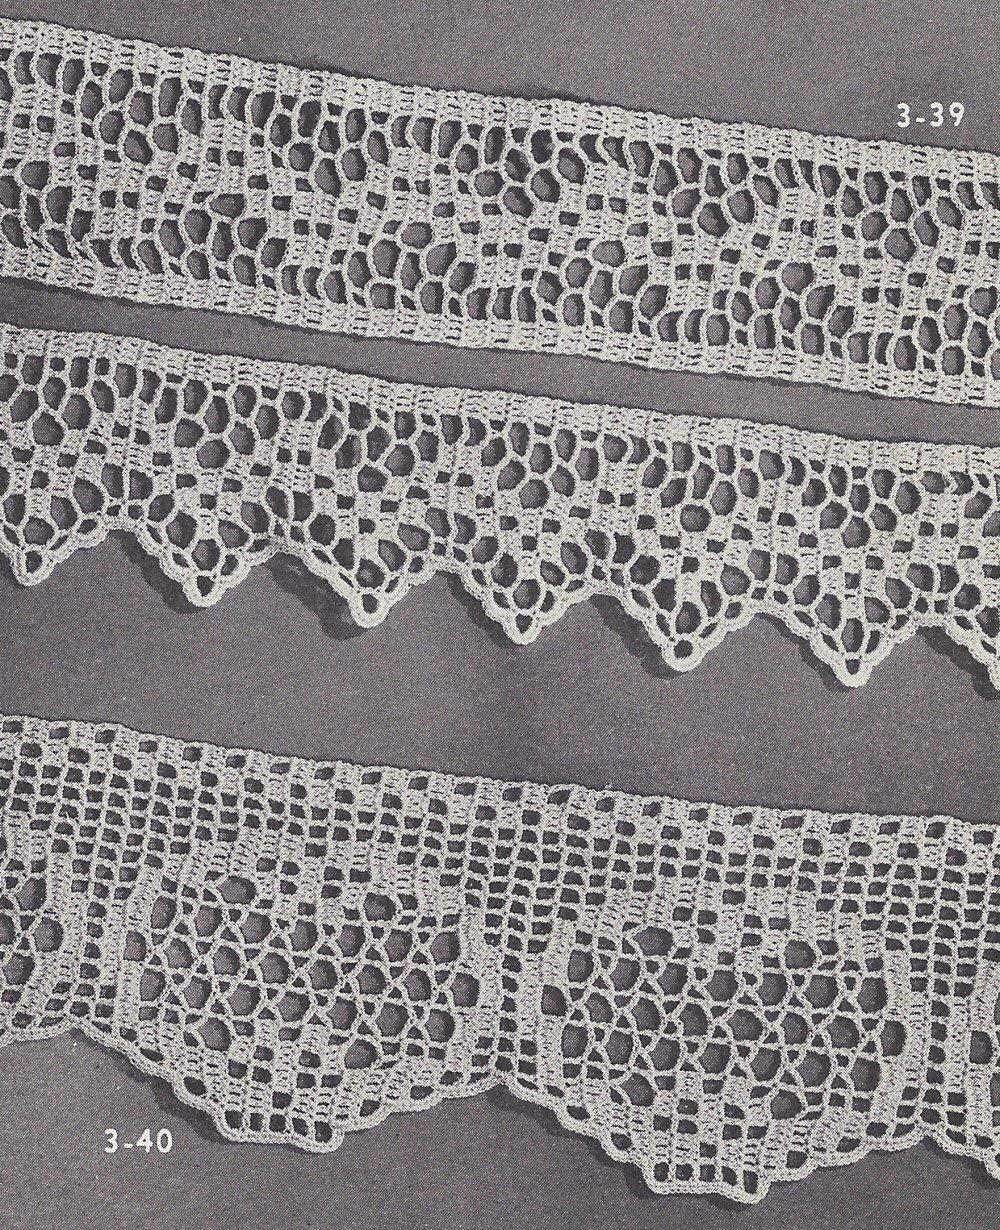 Cheap Crochet Lace Edging Pattern Free Find Crochet Lace Edging